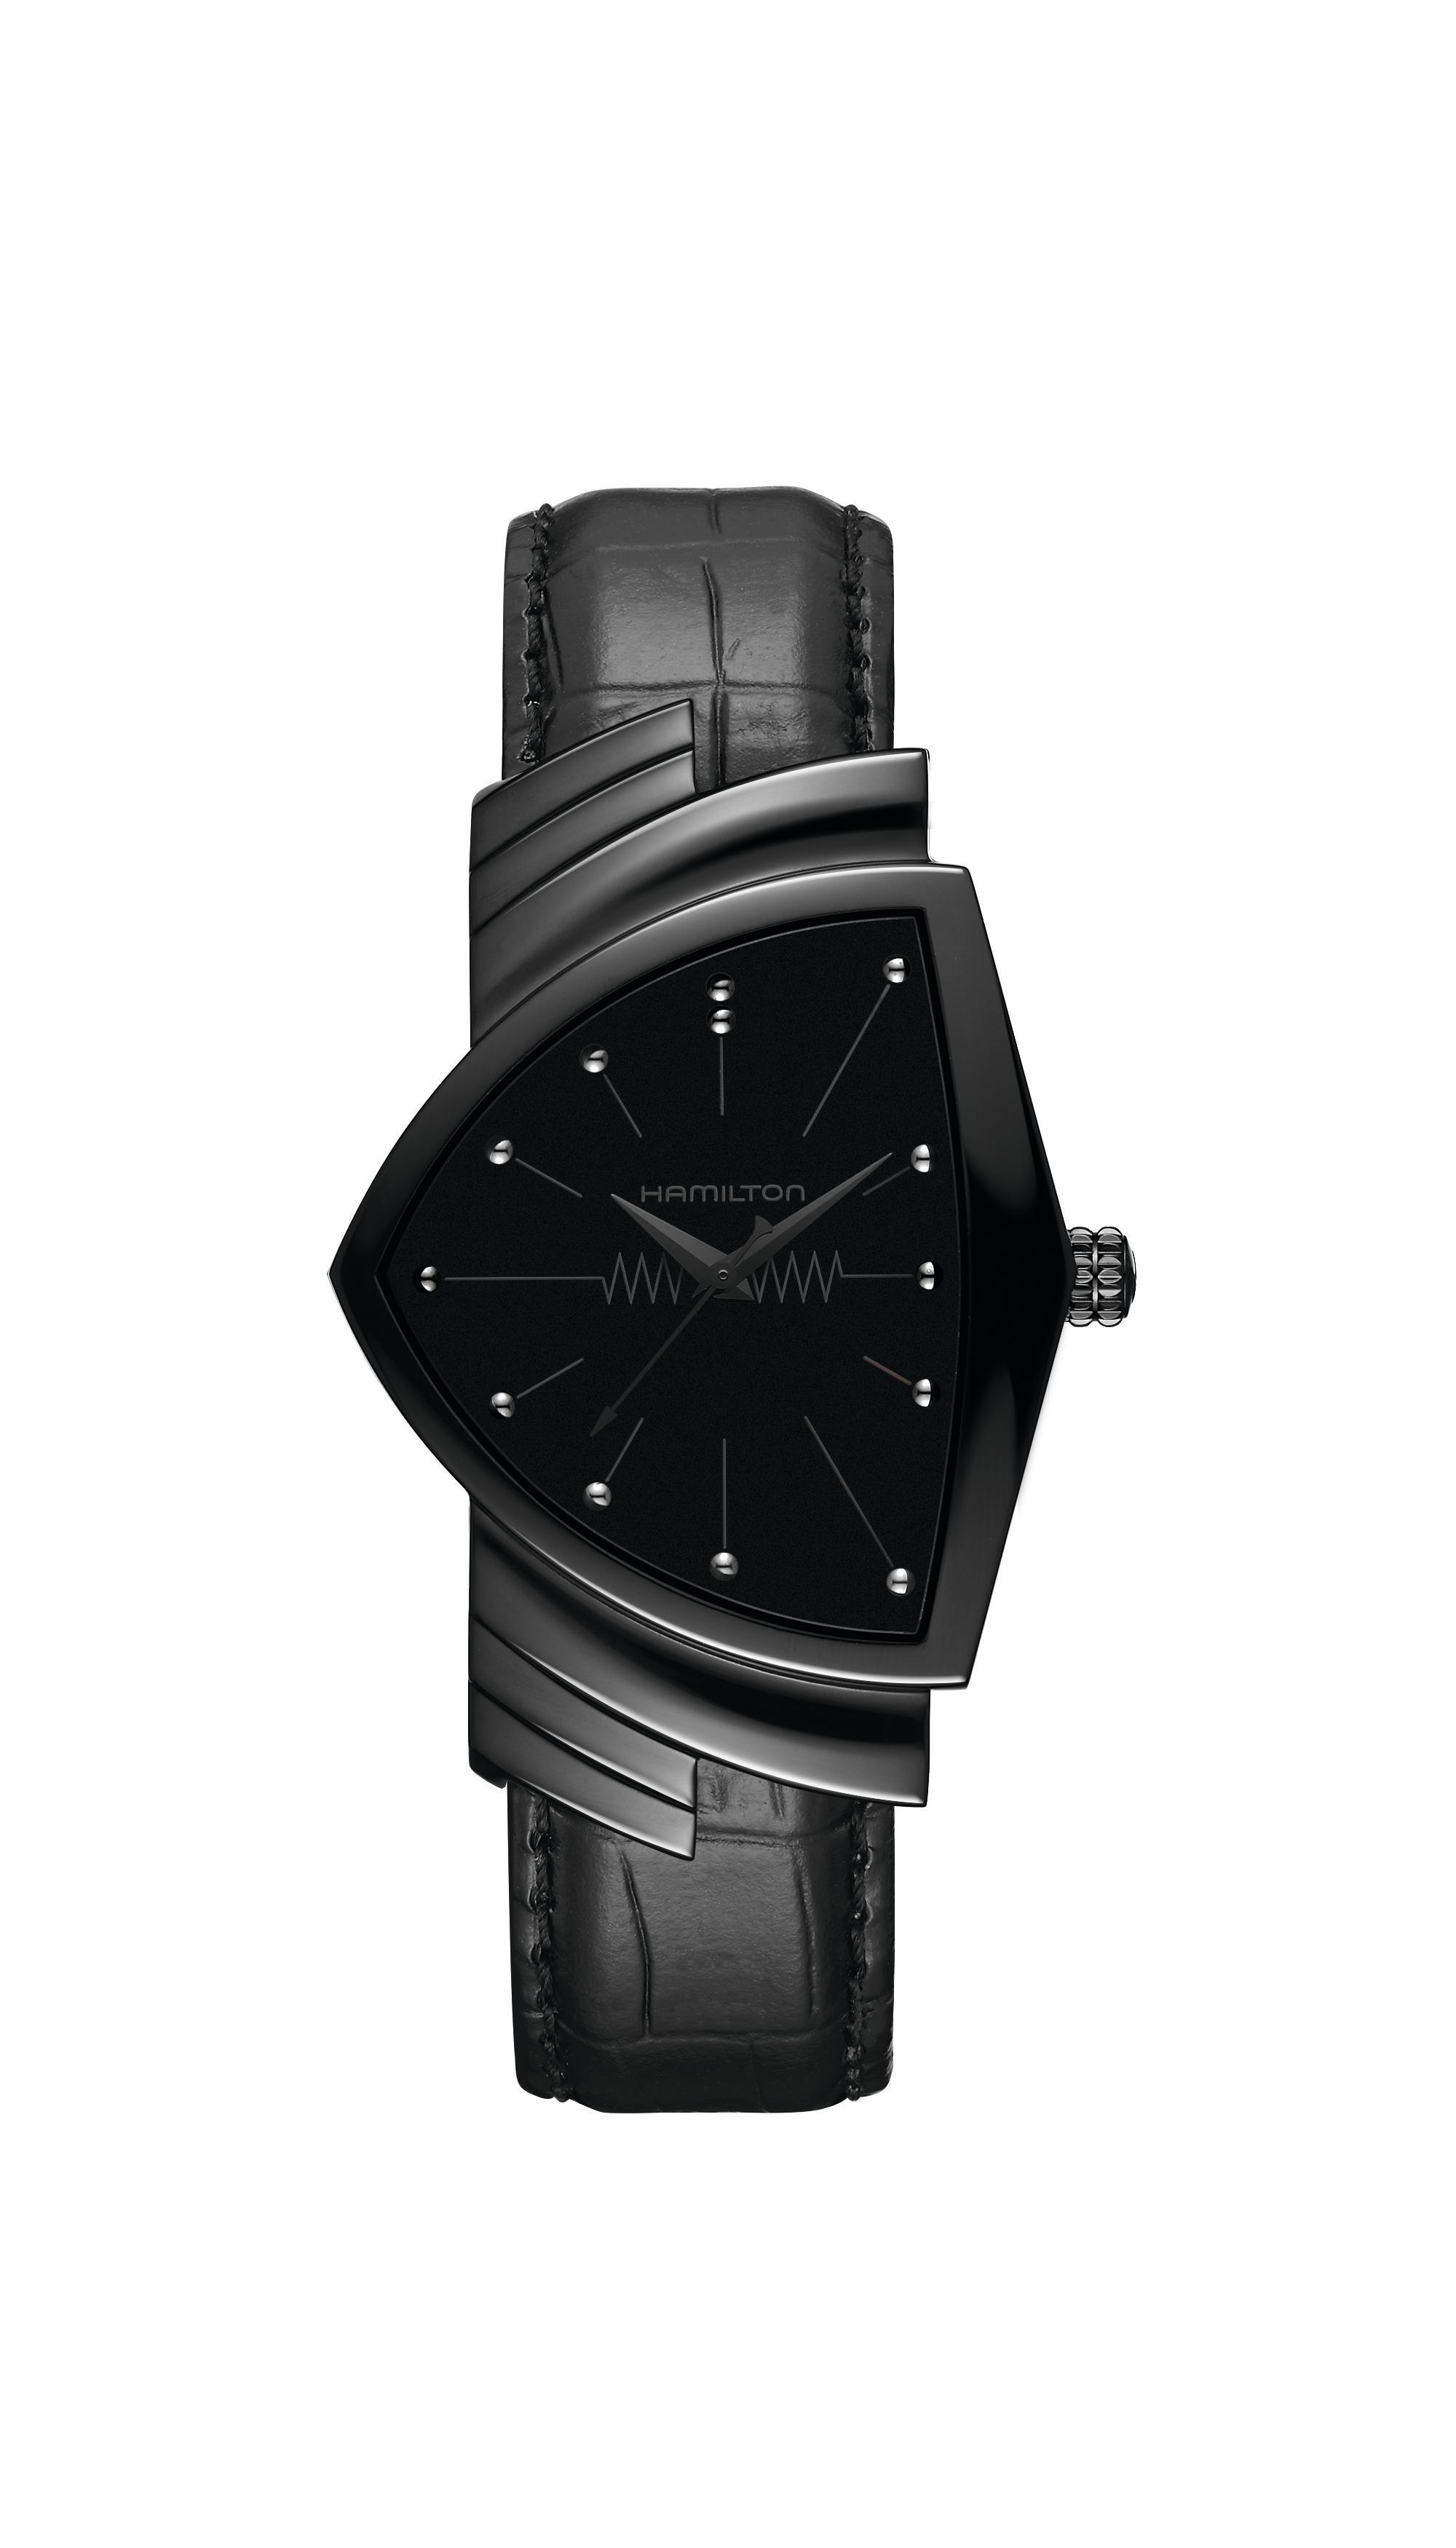 sports shoes 320eb 77ff2 ハミルトンの腕時計「ベンチュラ」BEAMSにて先行予約受付開始 ...